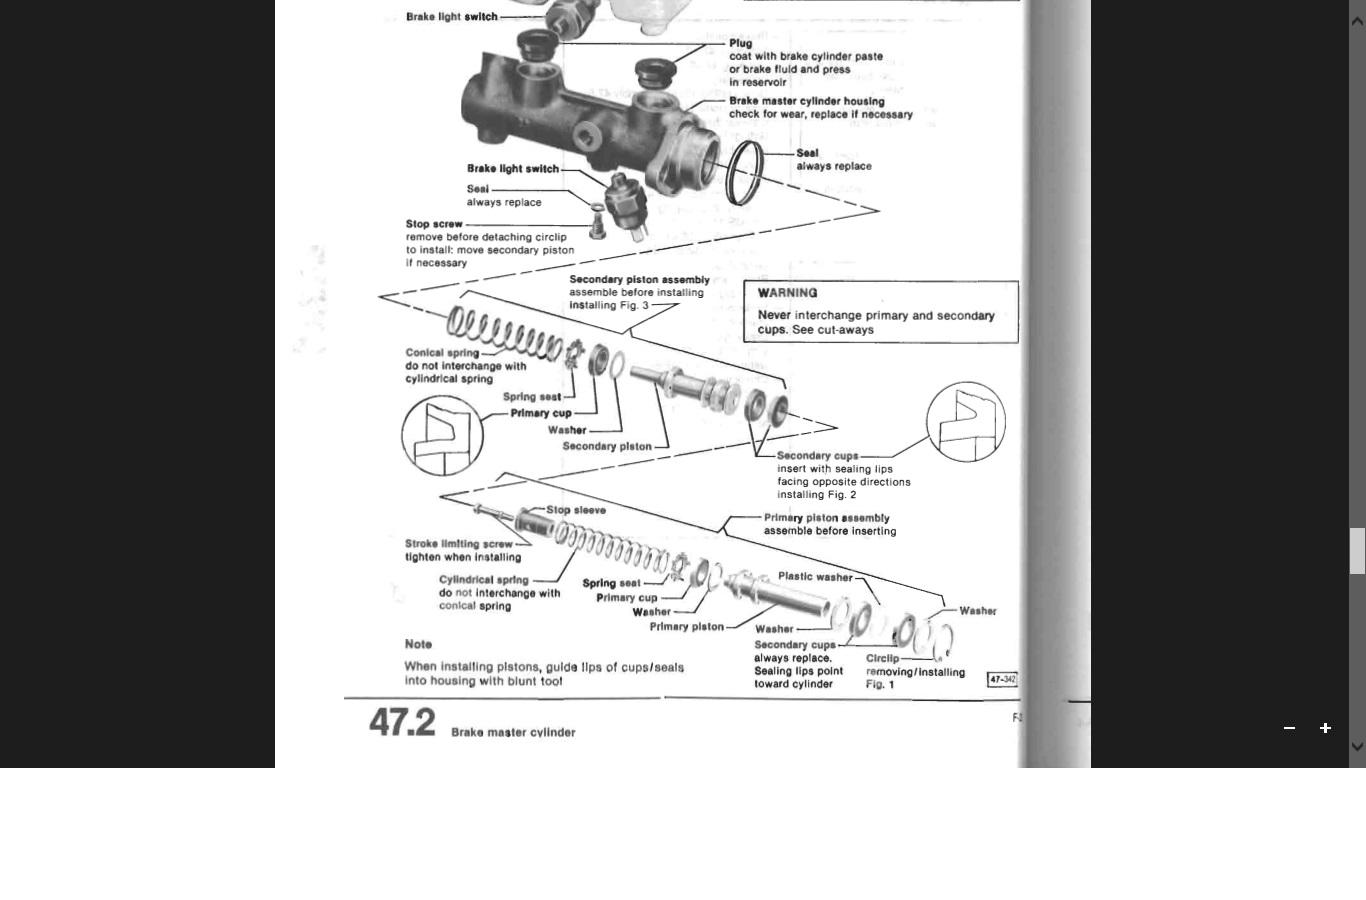 1621655 thesamba com vanagon view topic master cylinder rebuild  at soozxer.org